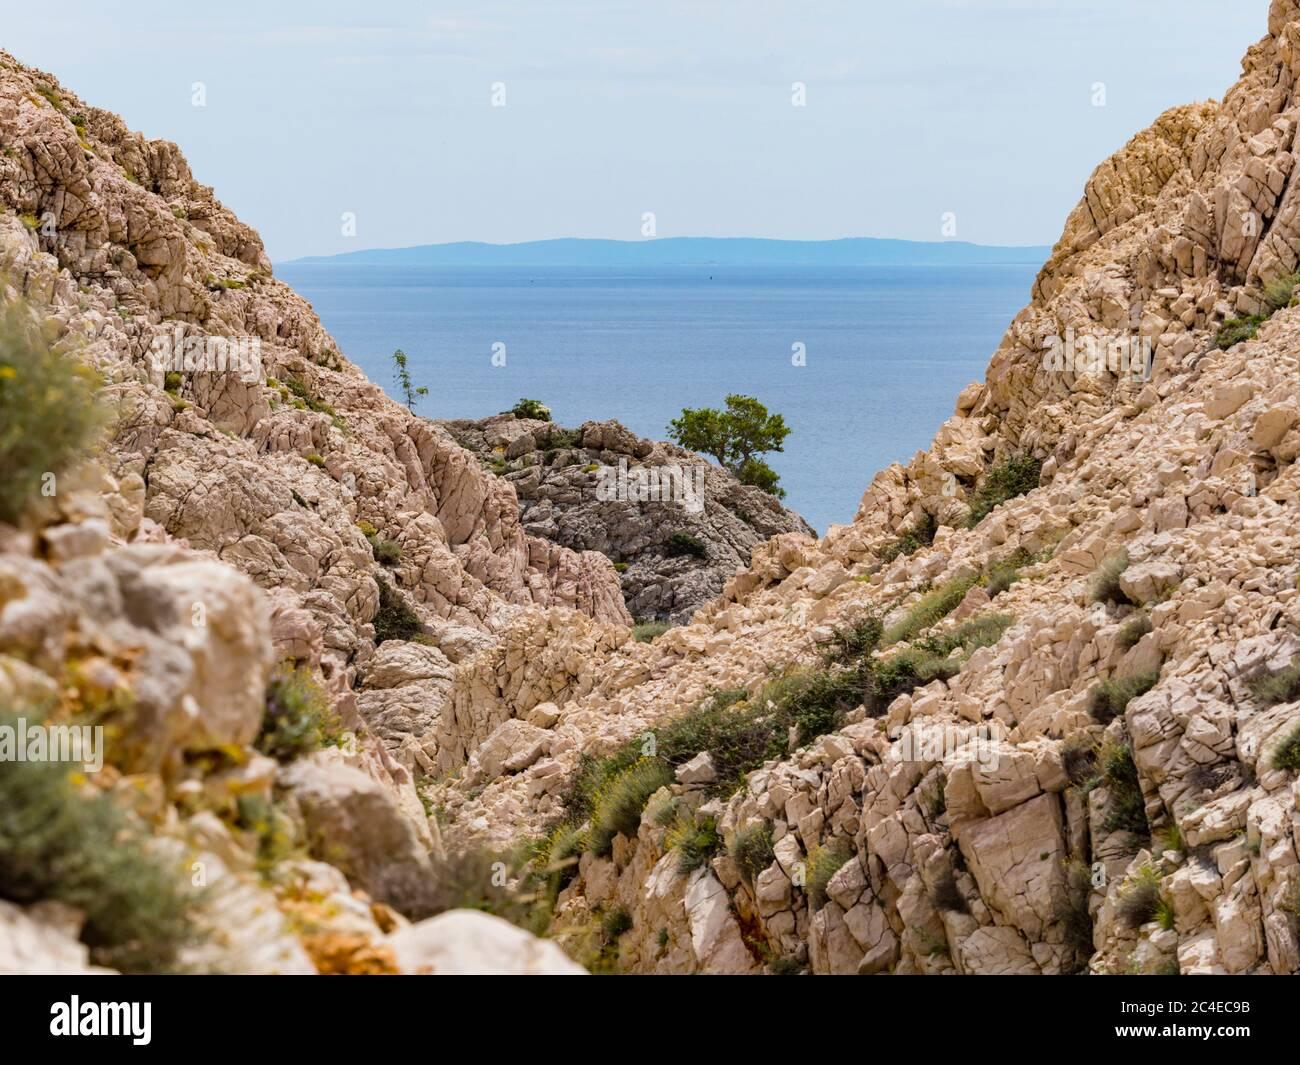 Stara Baska island Krk Croatia Europe Stock Photo